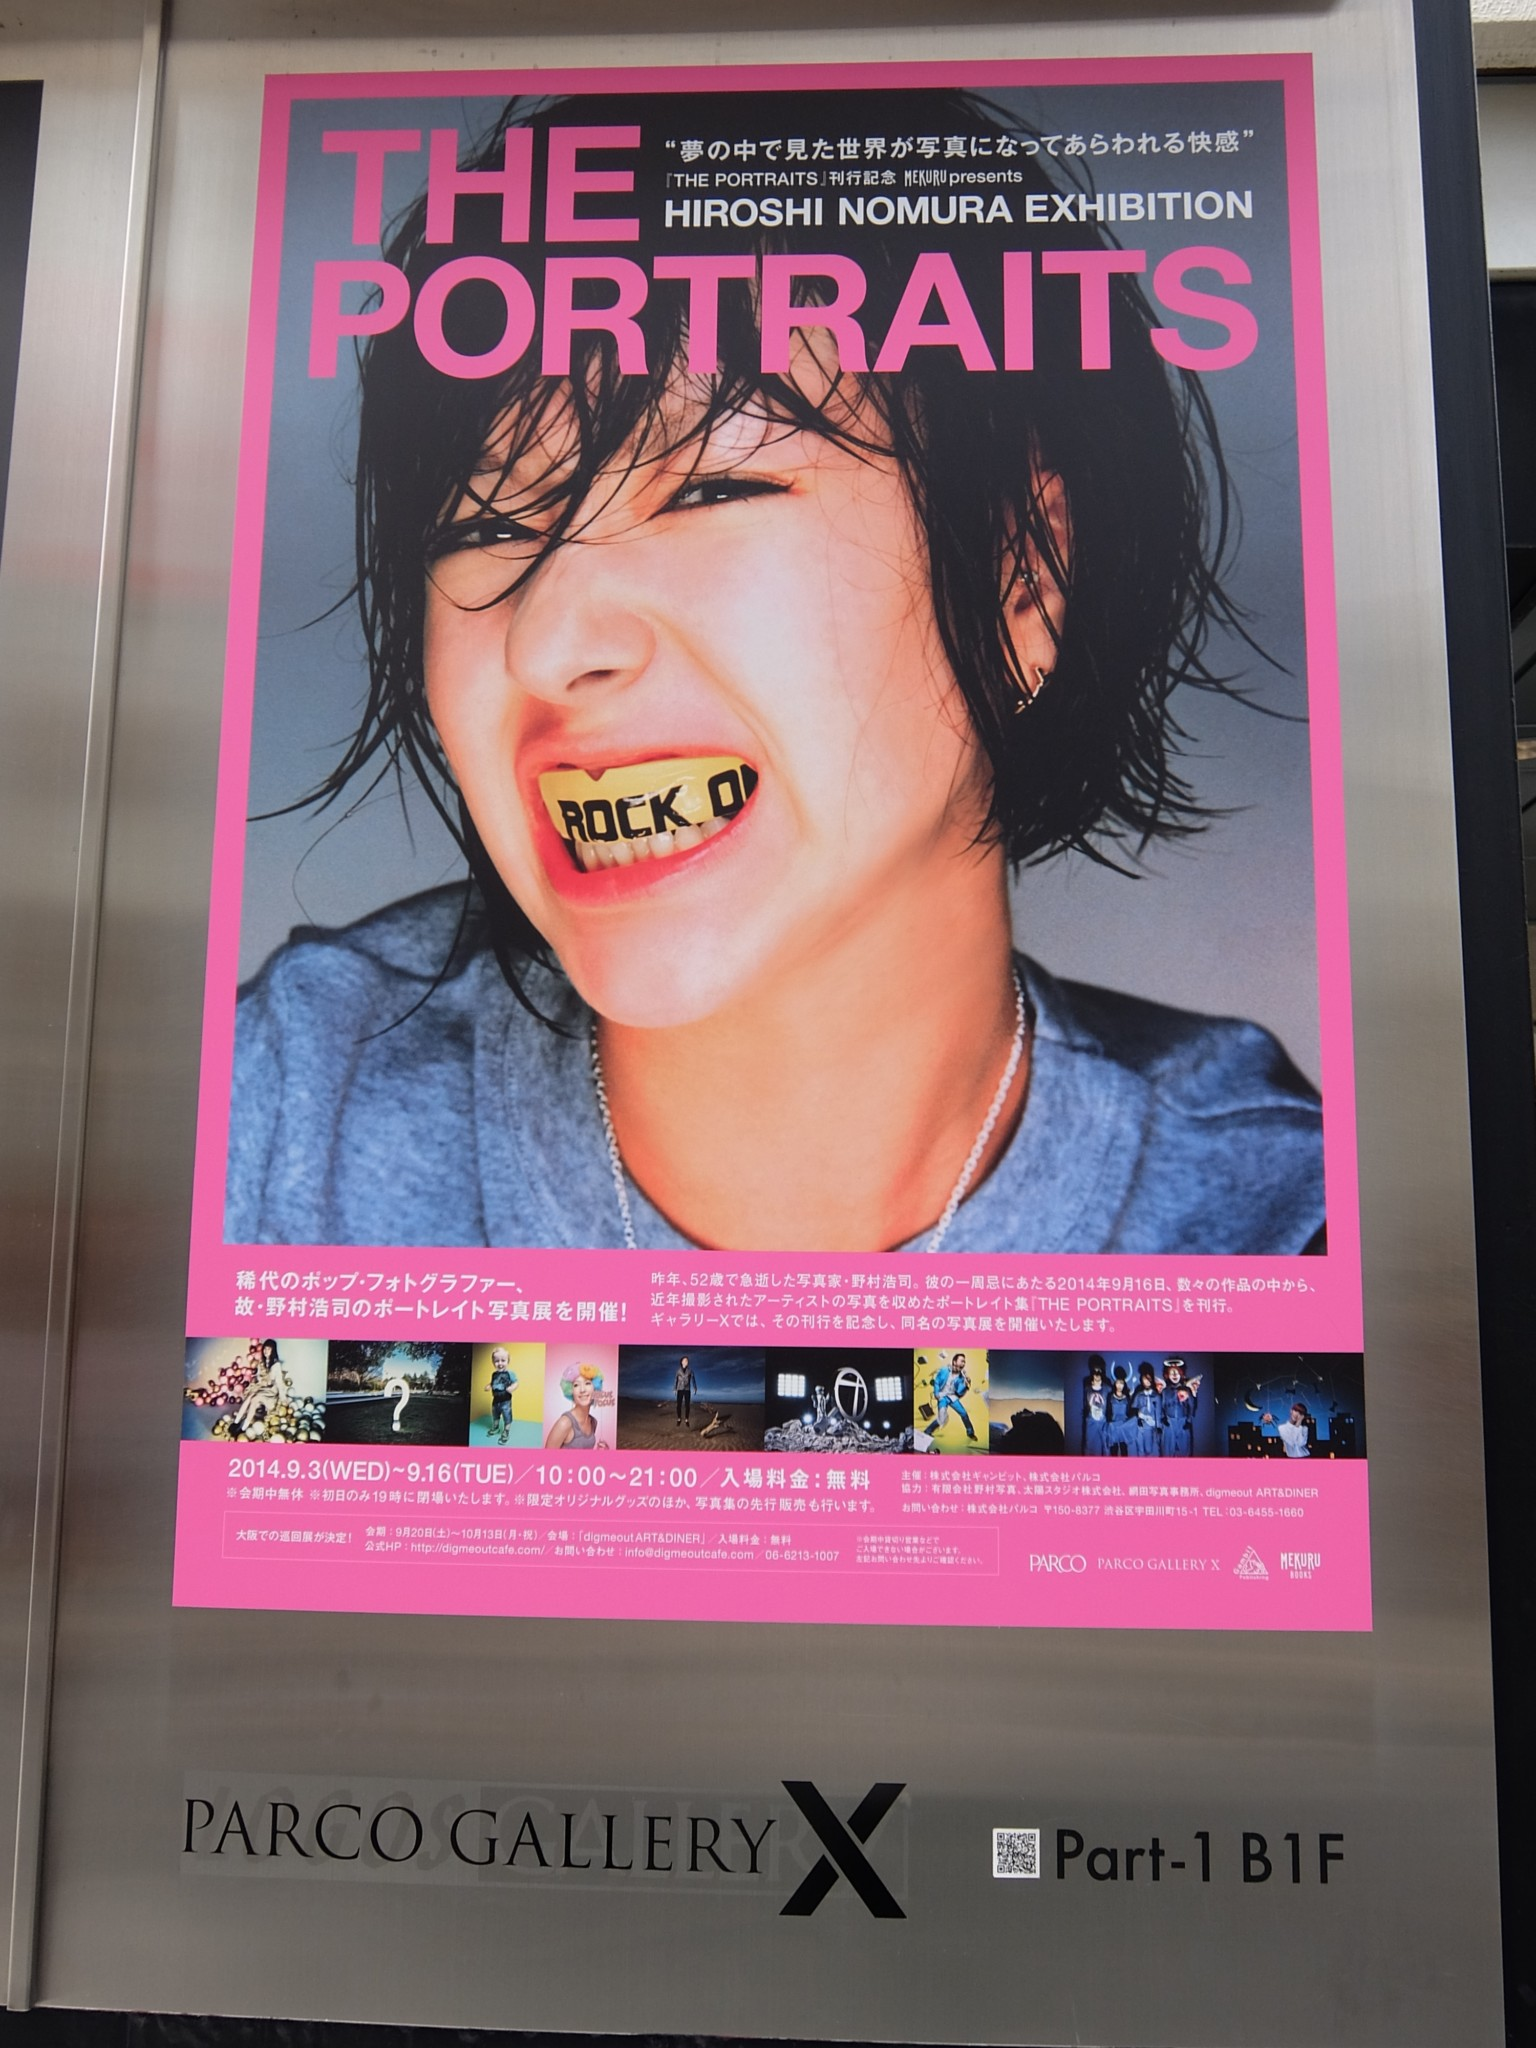 THE PORTRAITS HIROSHI NOMURA EXHIBITION